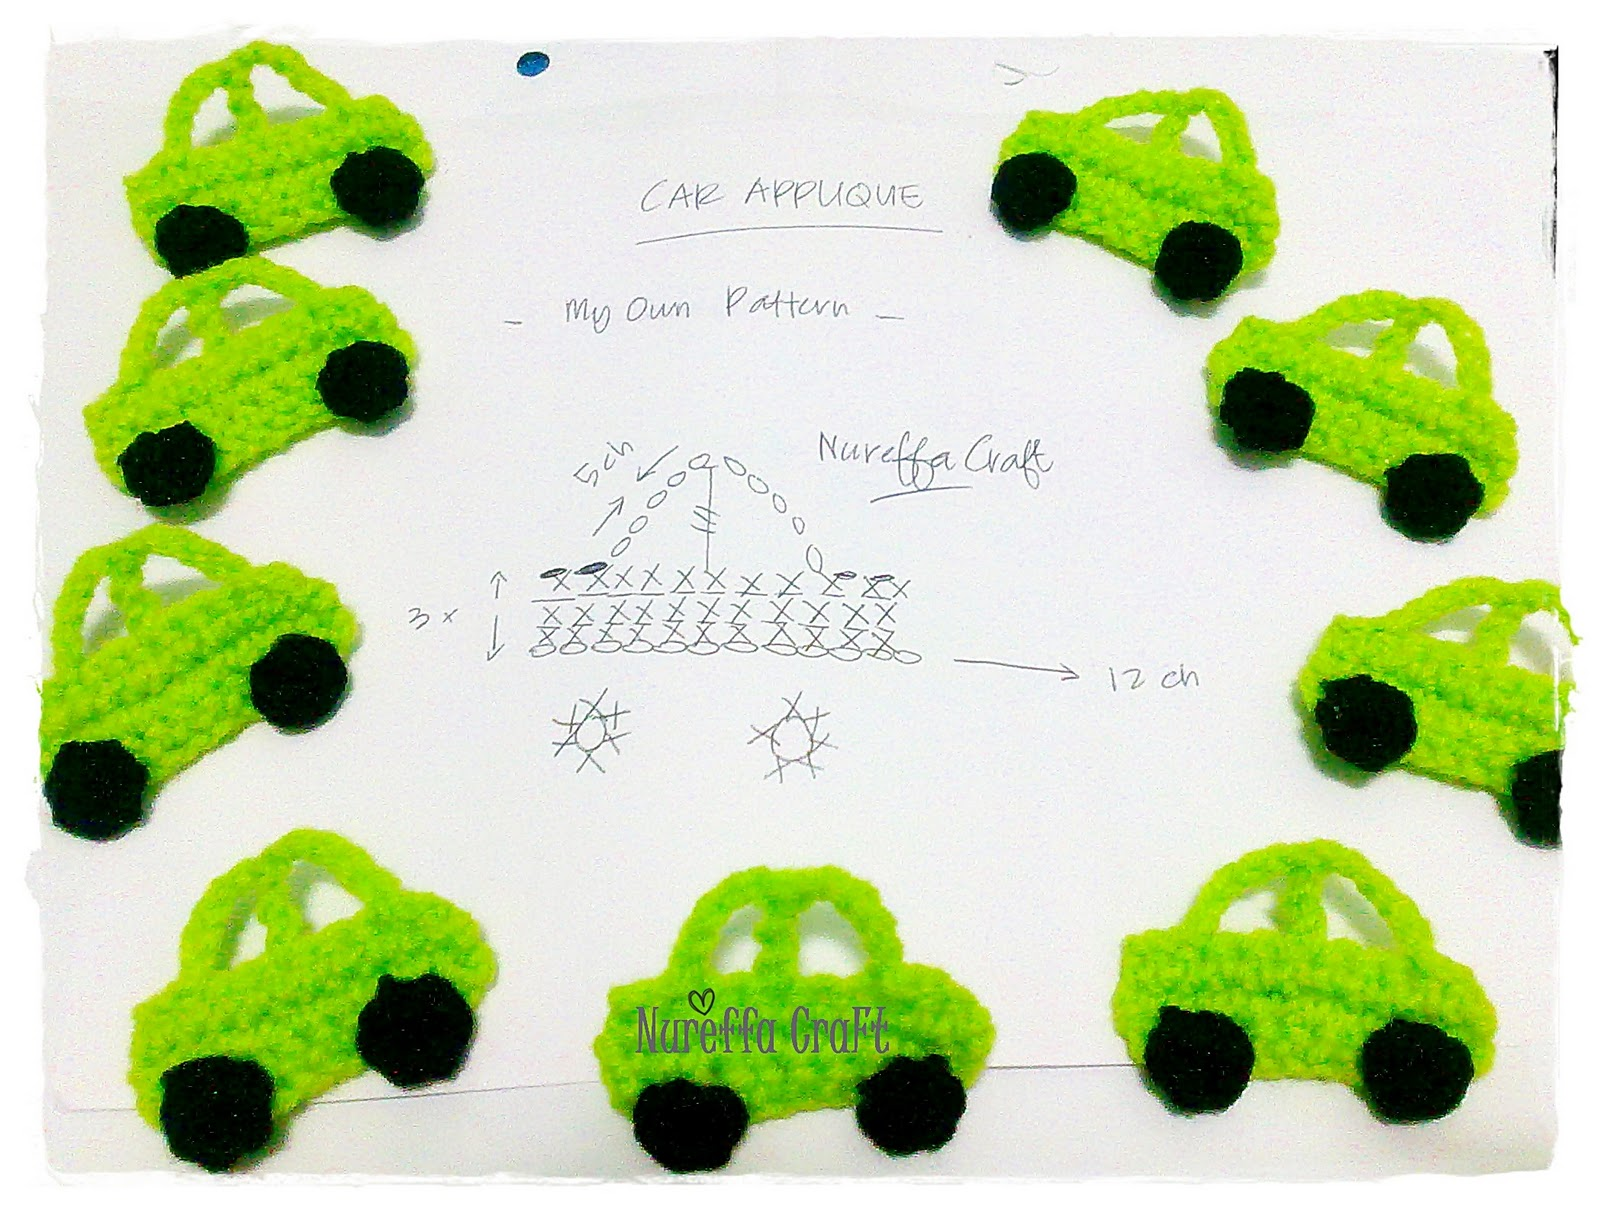 Amigurumi Patterns Cars : Nureffa craft ::: :: crochet free pattern car applique ::